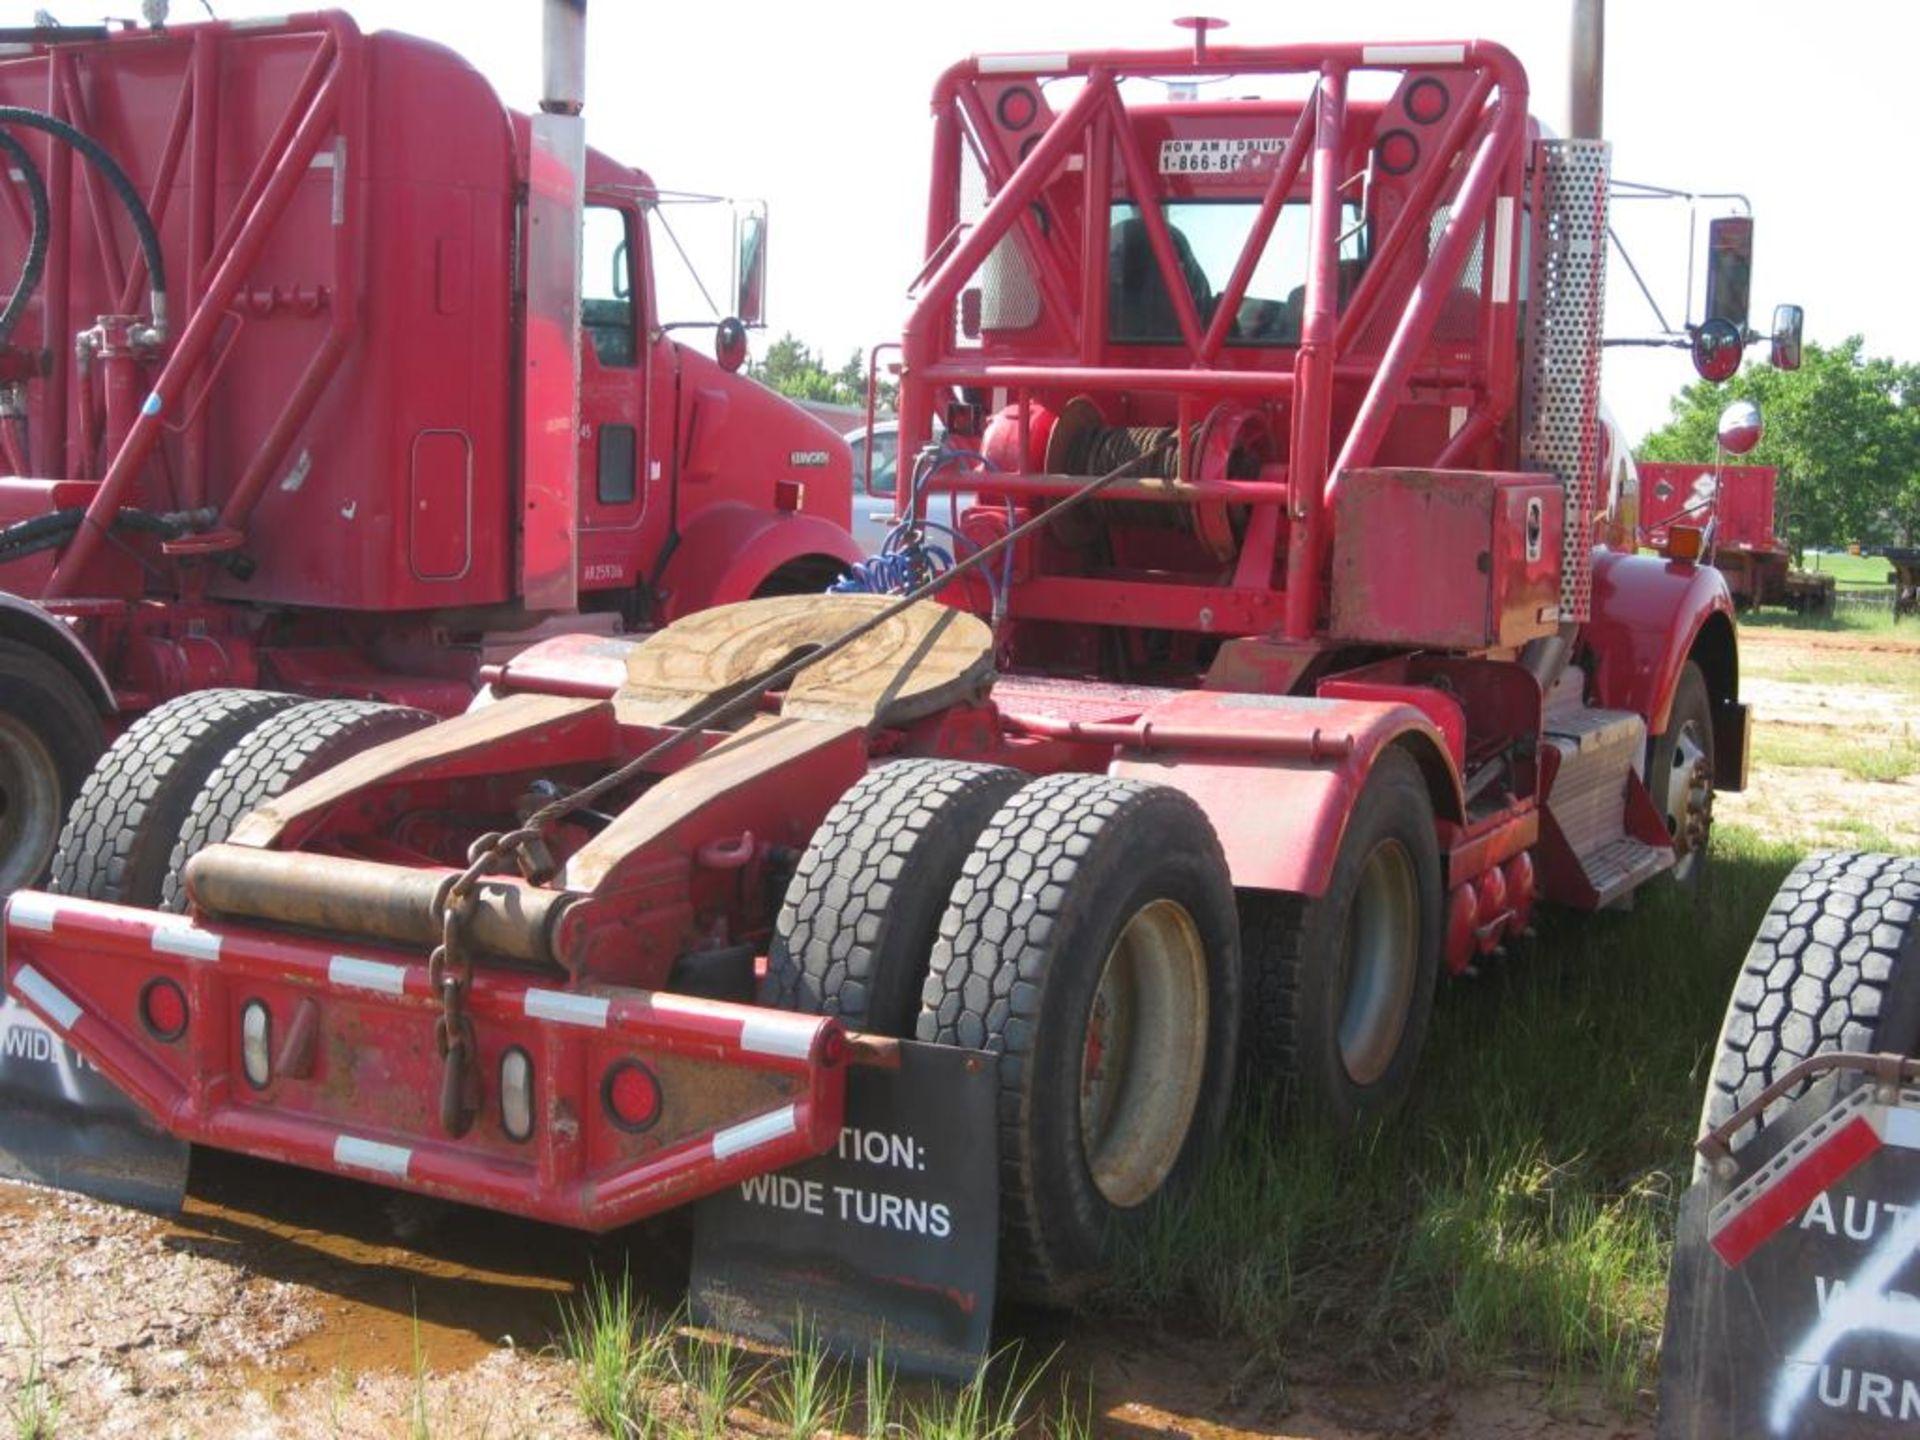 Kenworth Winch Truck - Image 5 of 25